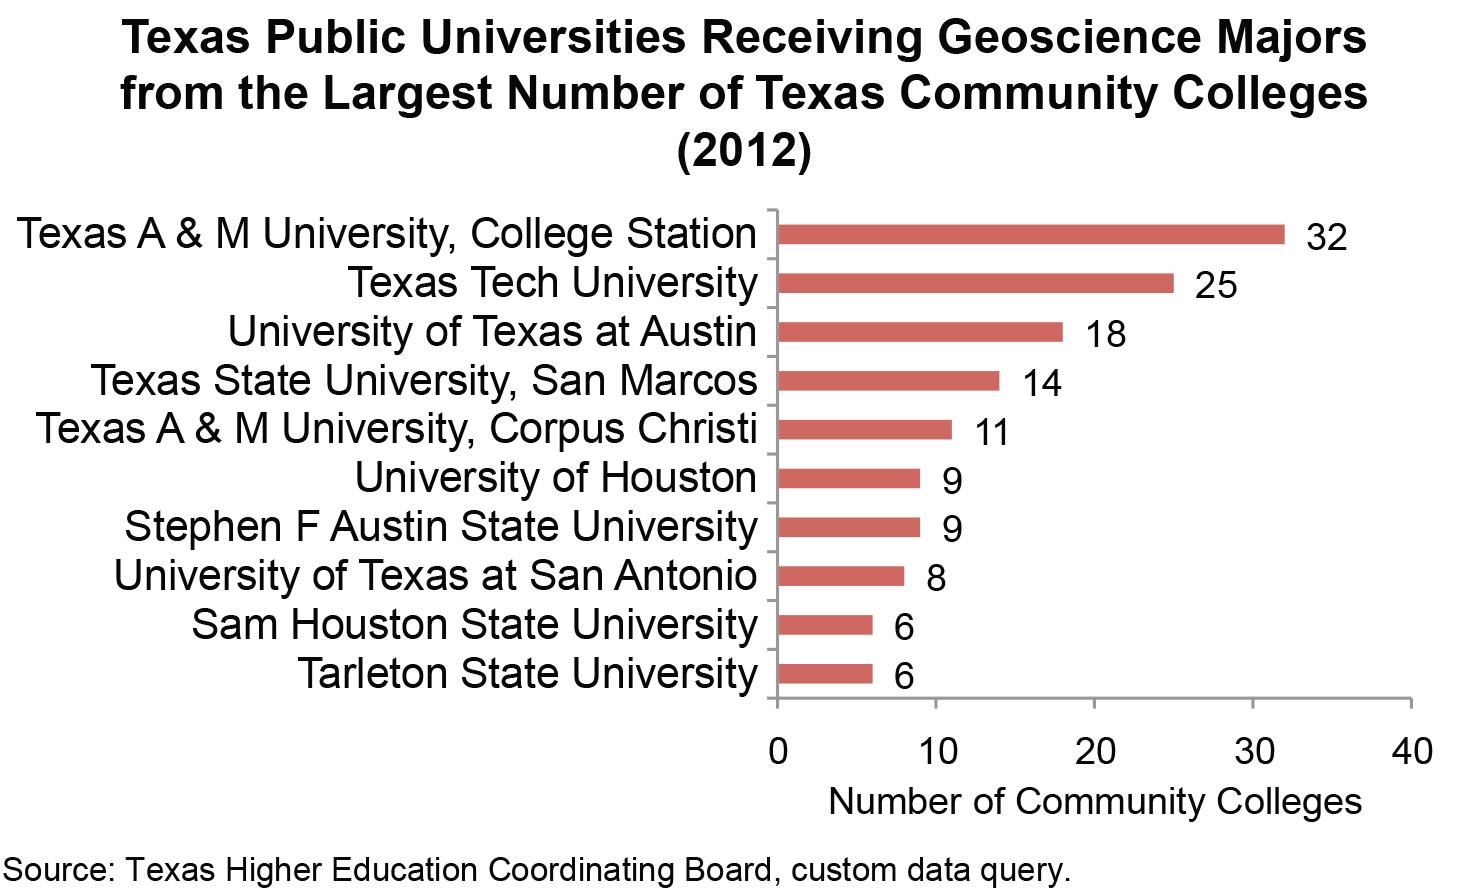 Public Universities Receiving Geoscience Students from CC